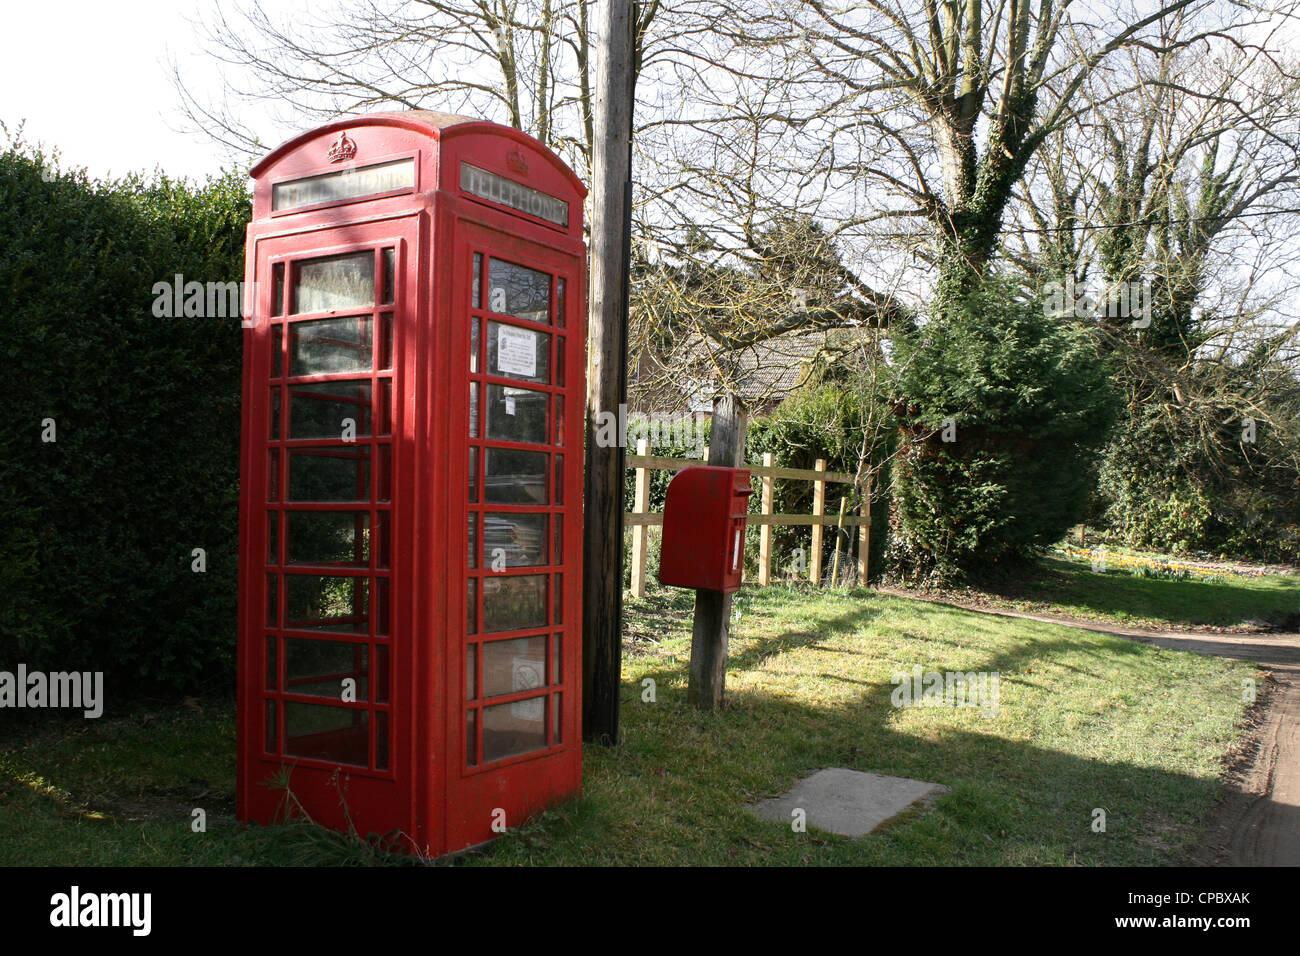 English post box and telephone kiosk Stock Photo